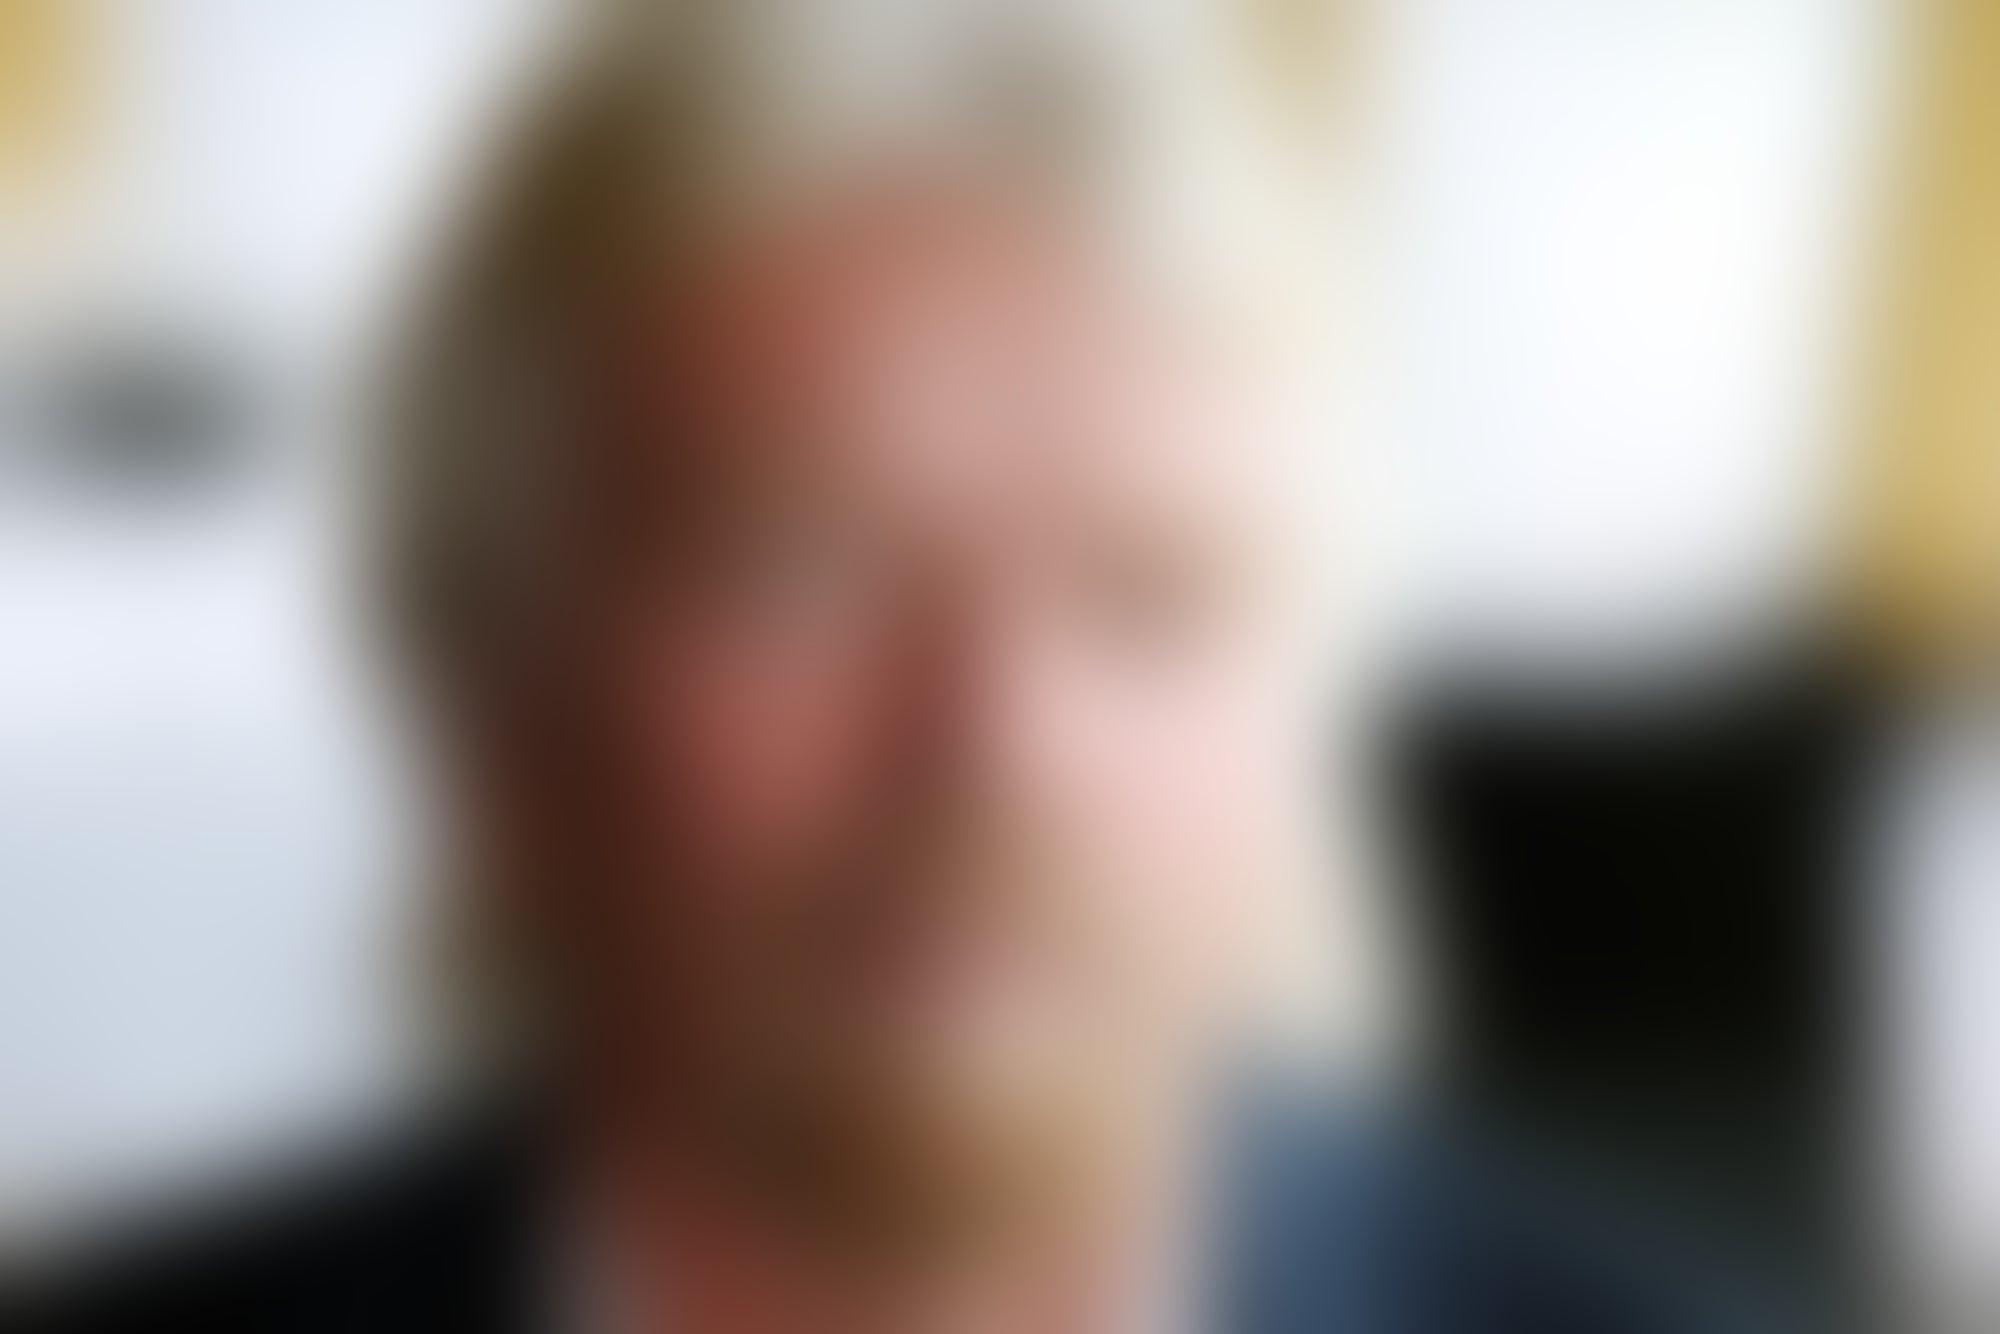 Richard Branson Blogs About His Near-Death Bike Accident